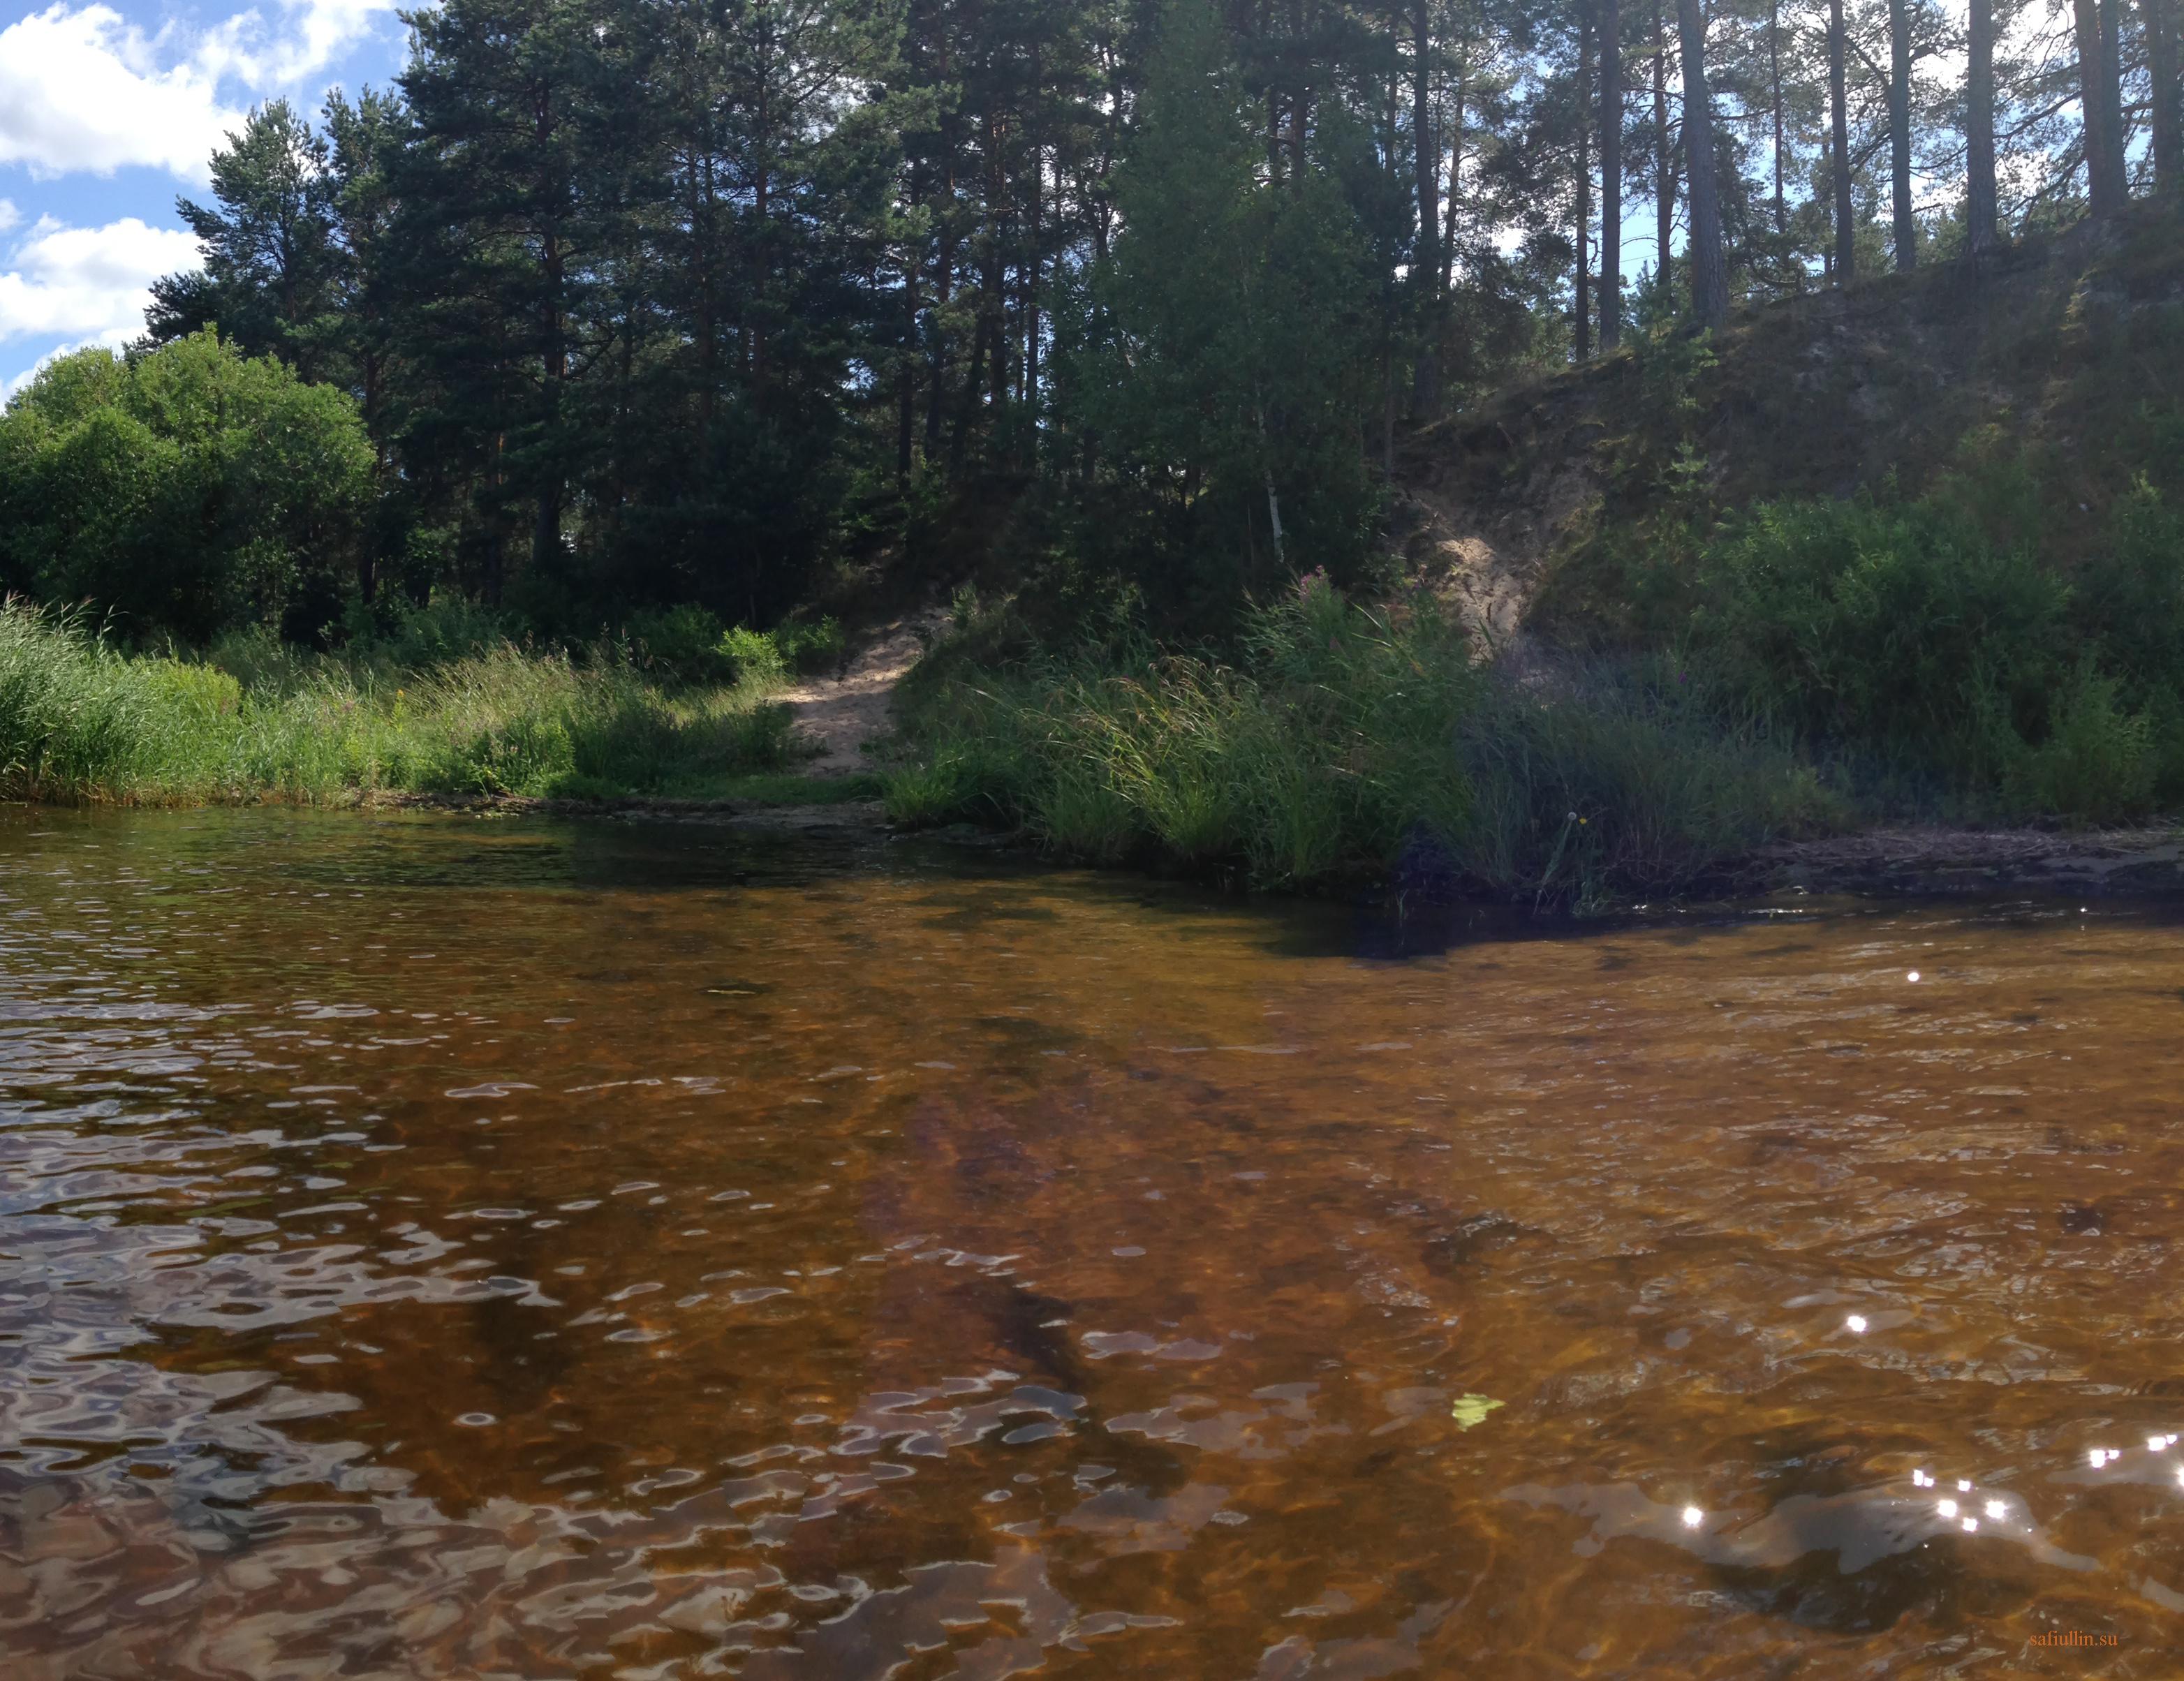 пейзажи природы альберт сафиуллин лето река лиелупе